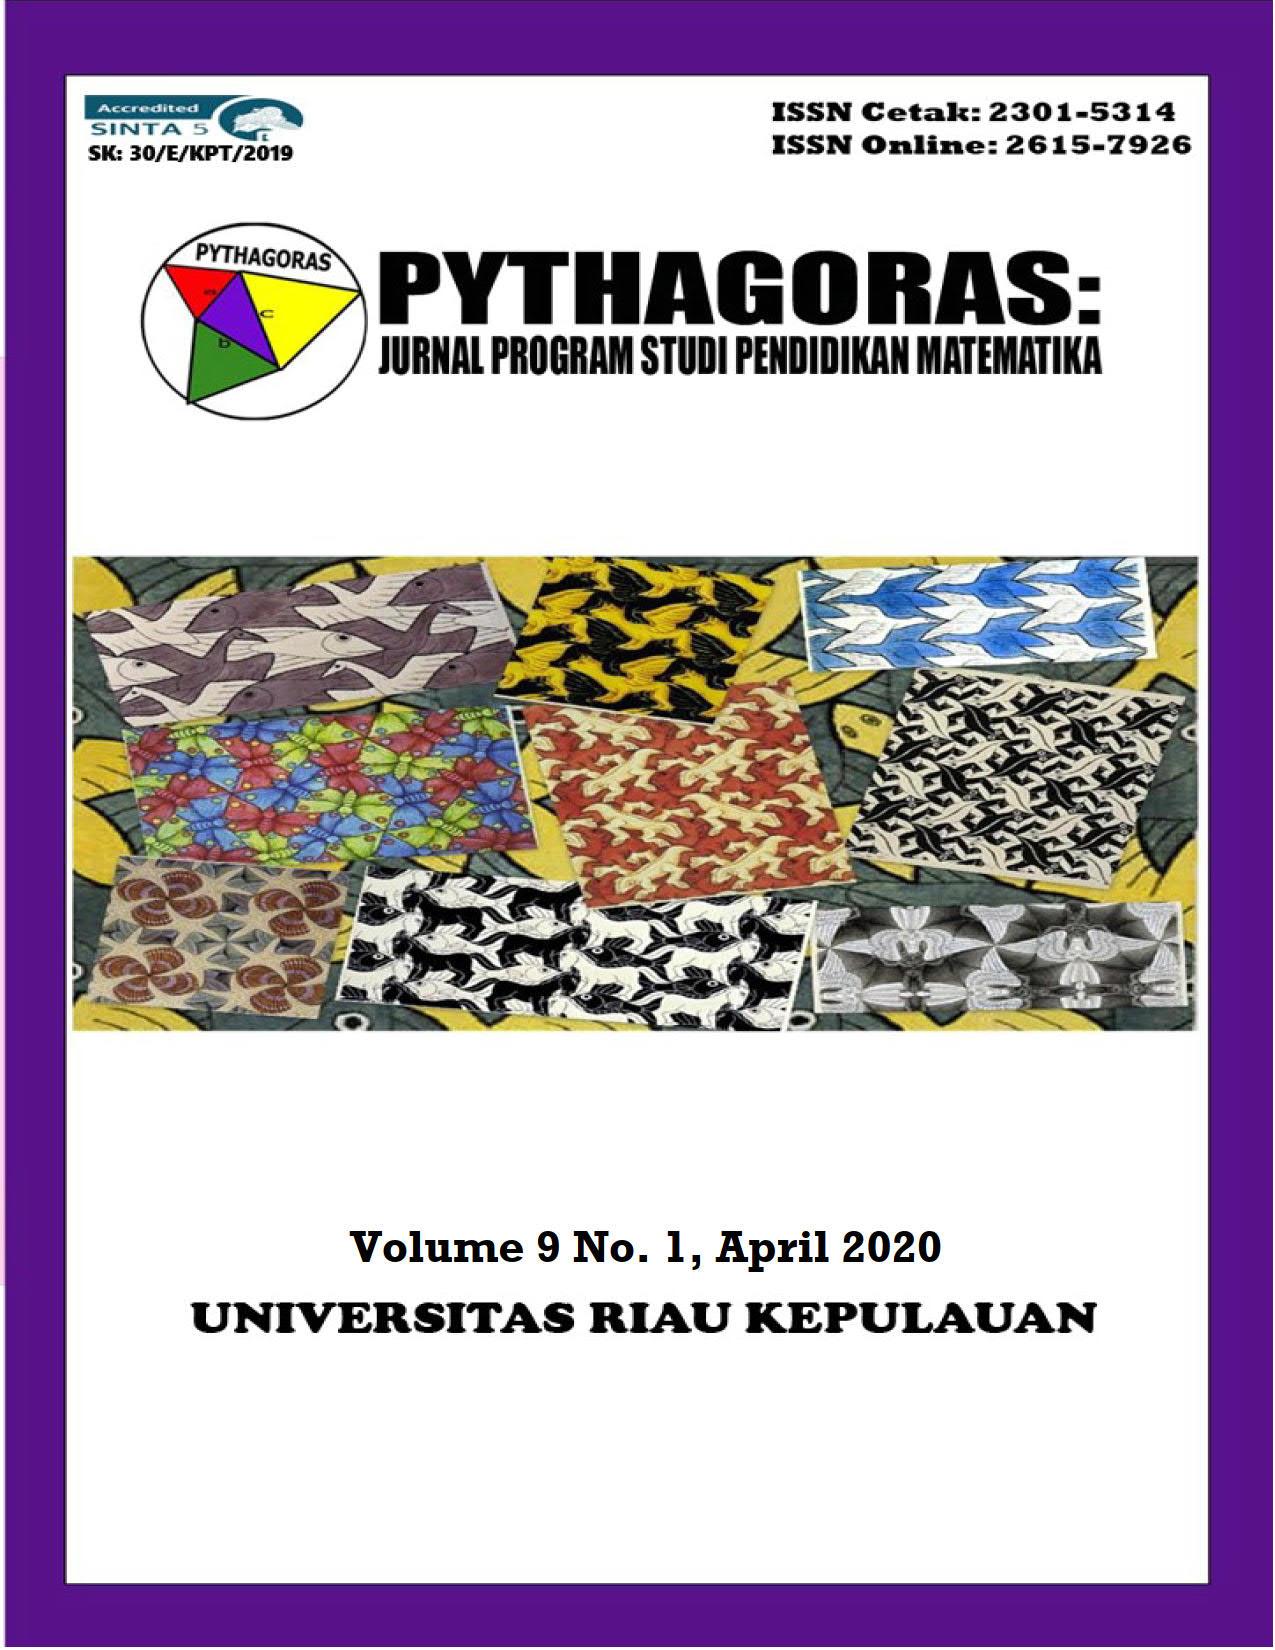 Vol 9, No. 1 (2020)